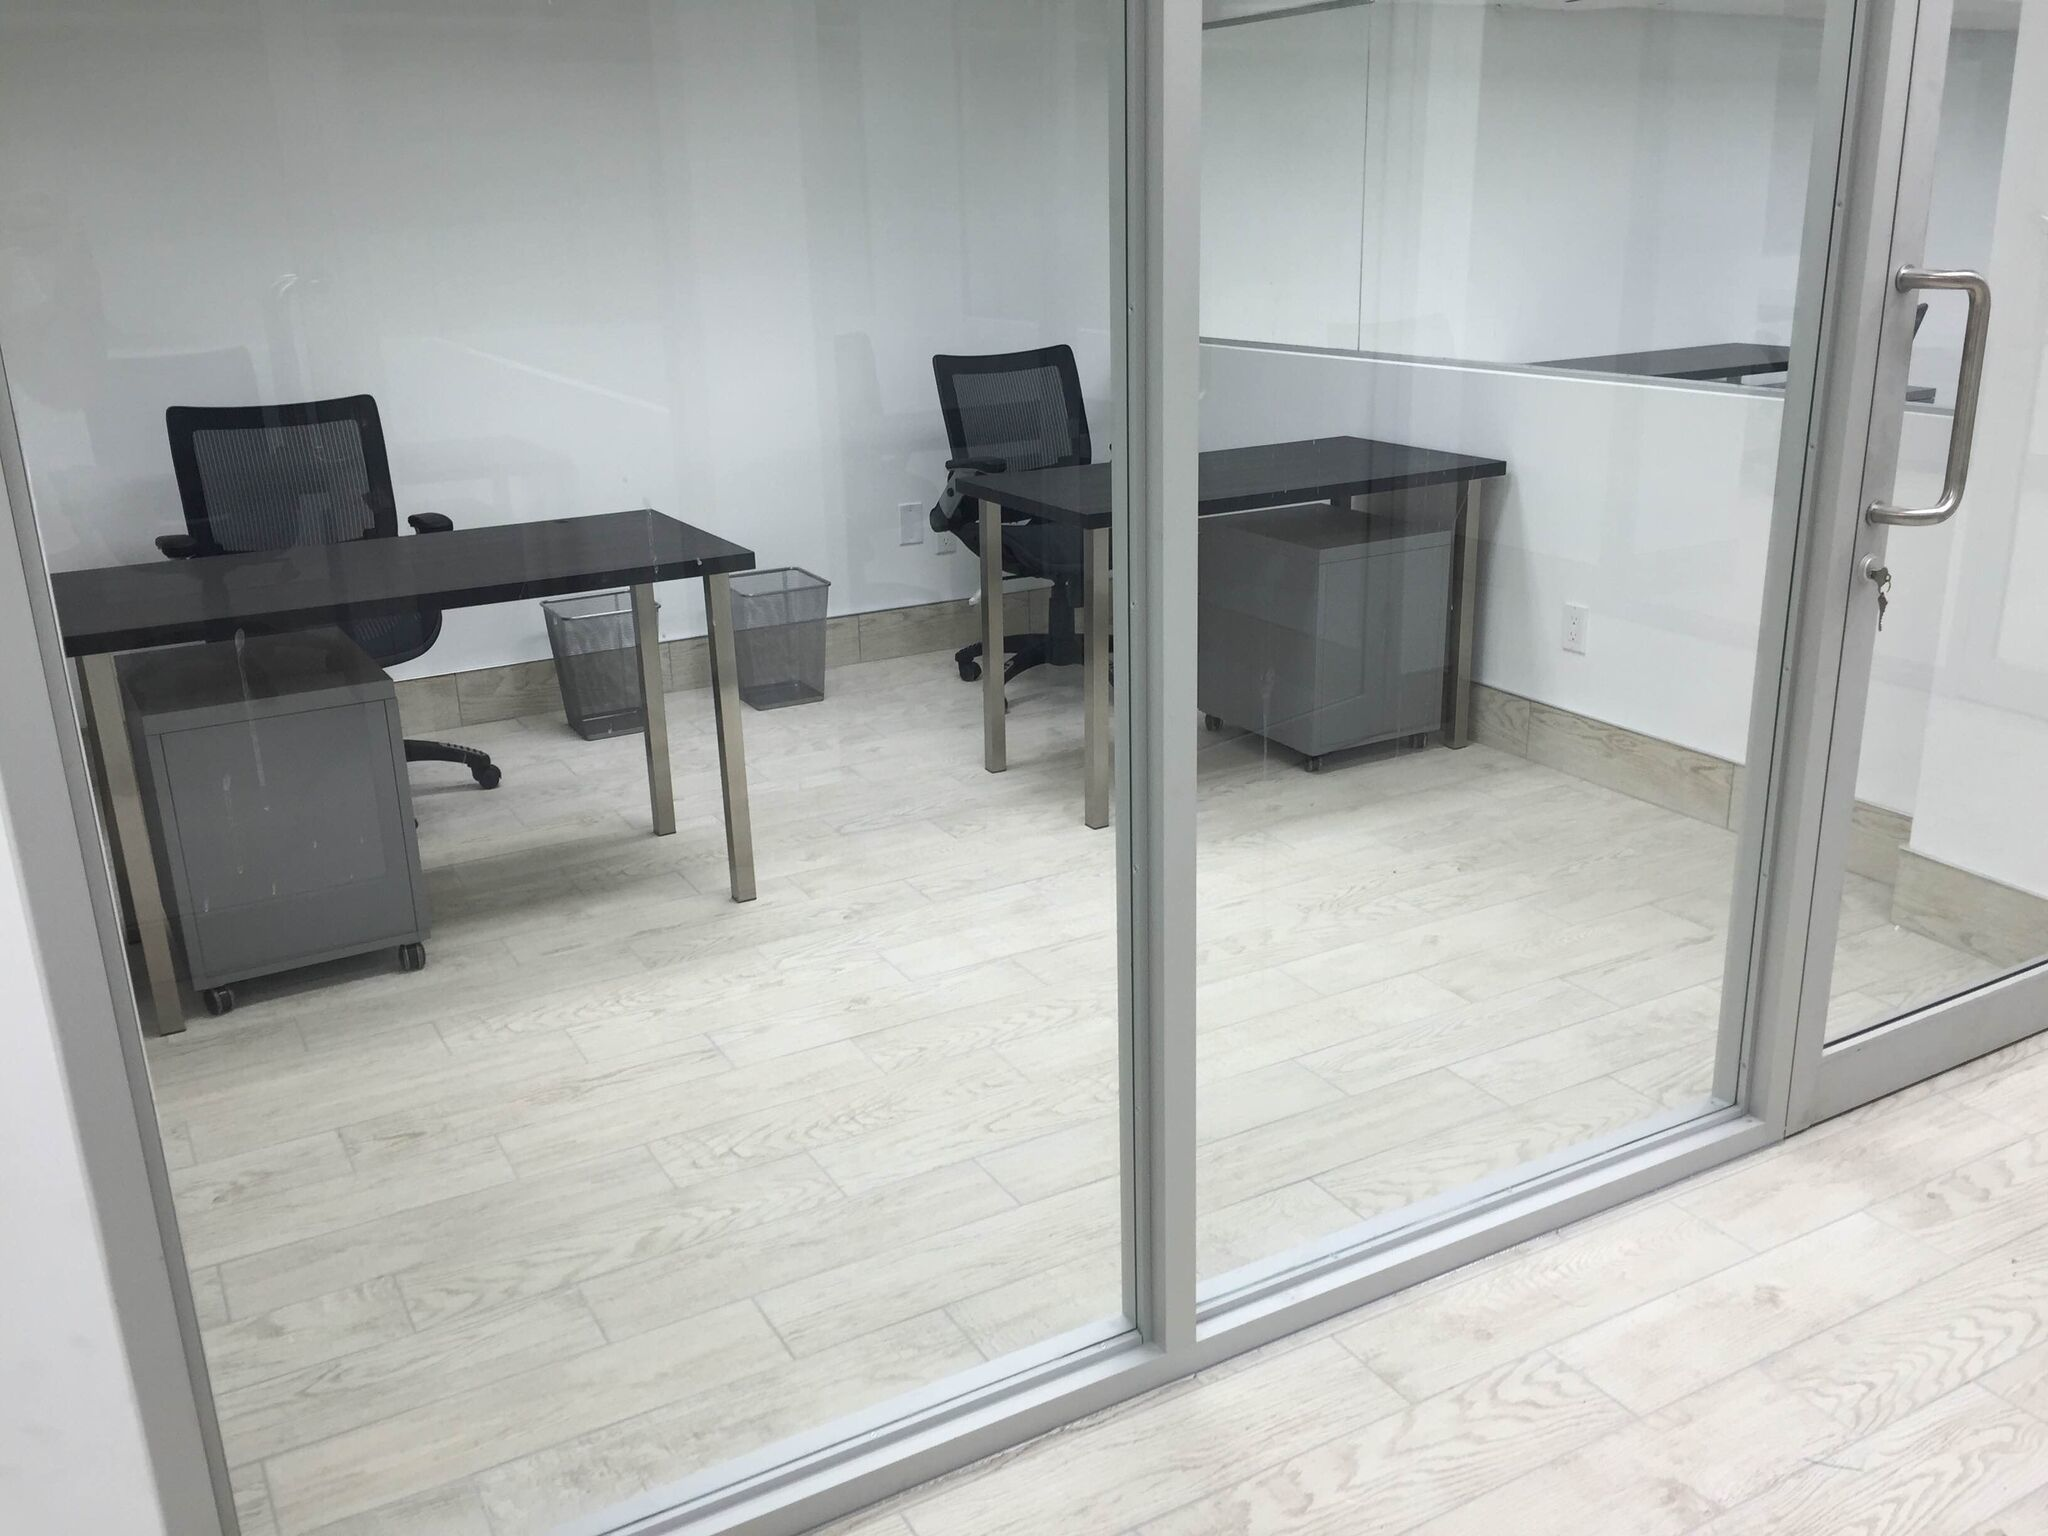 private glassed office space desks near me. Black Bedroom Furniture Sets. Home Design Ideas